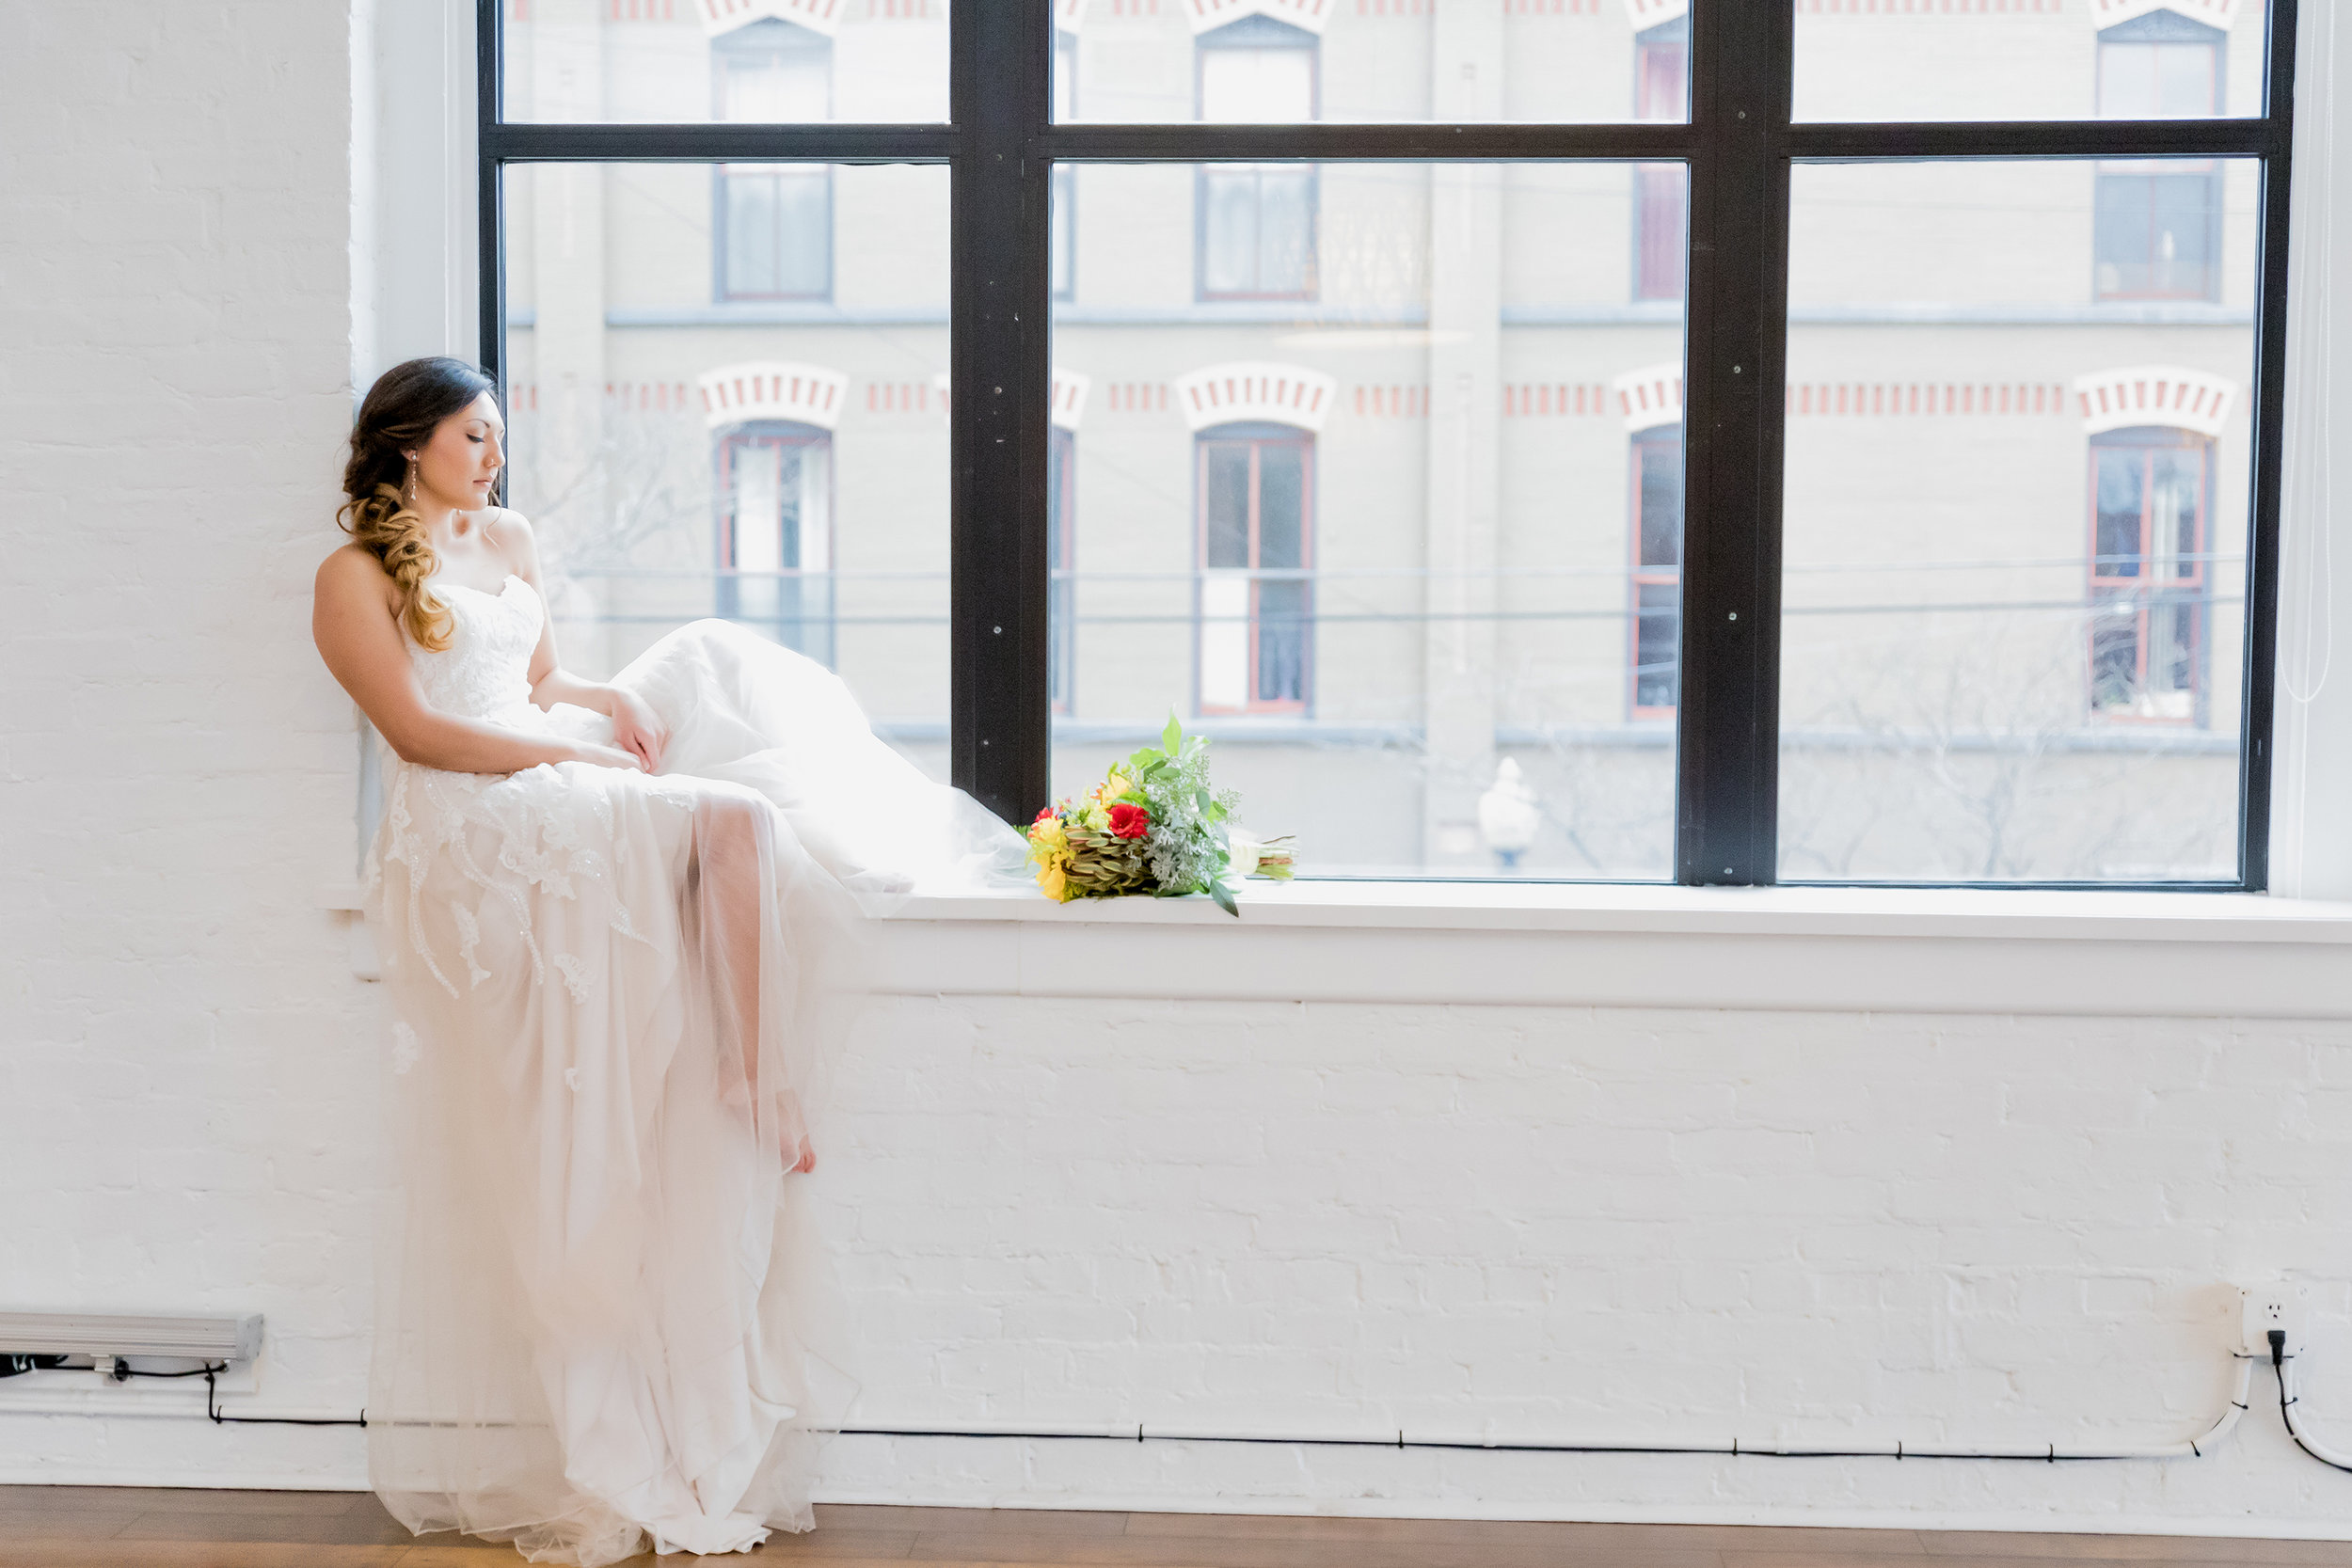 Bridal Shops Prom Dresses